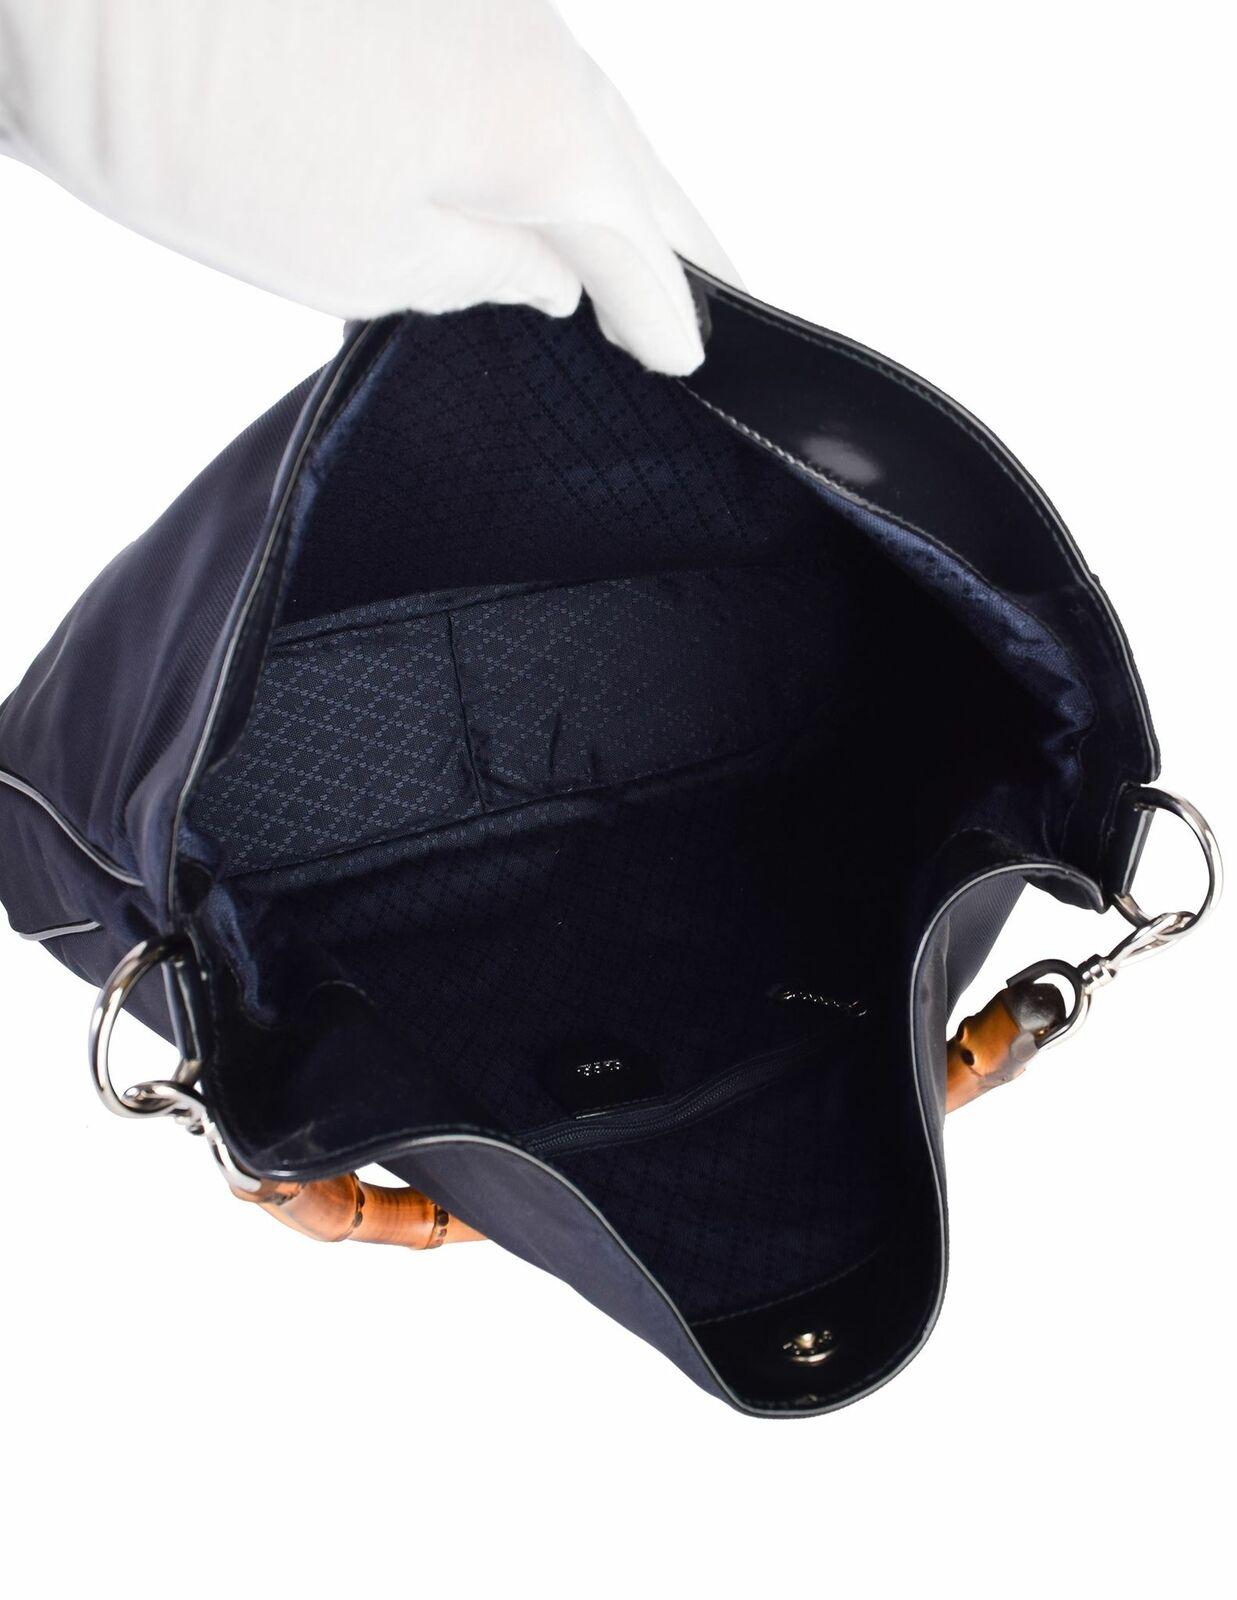 Gucci Vintage Large Navy Blue Nylon Patent Leathe… - image 10